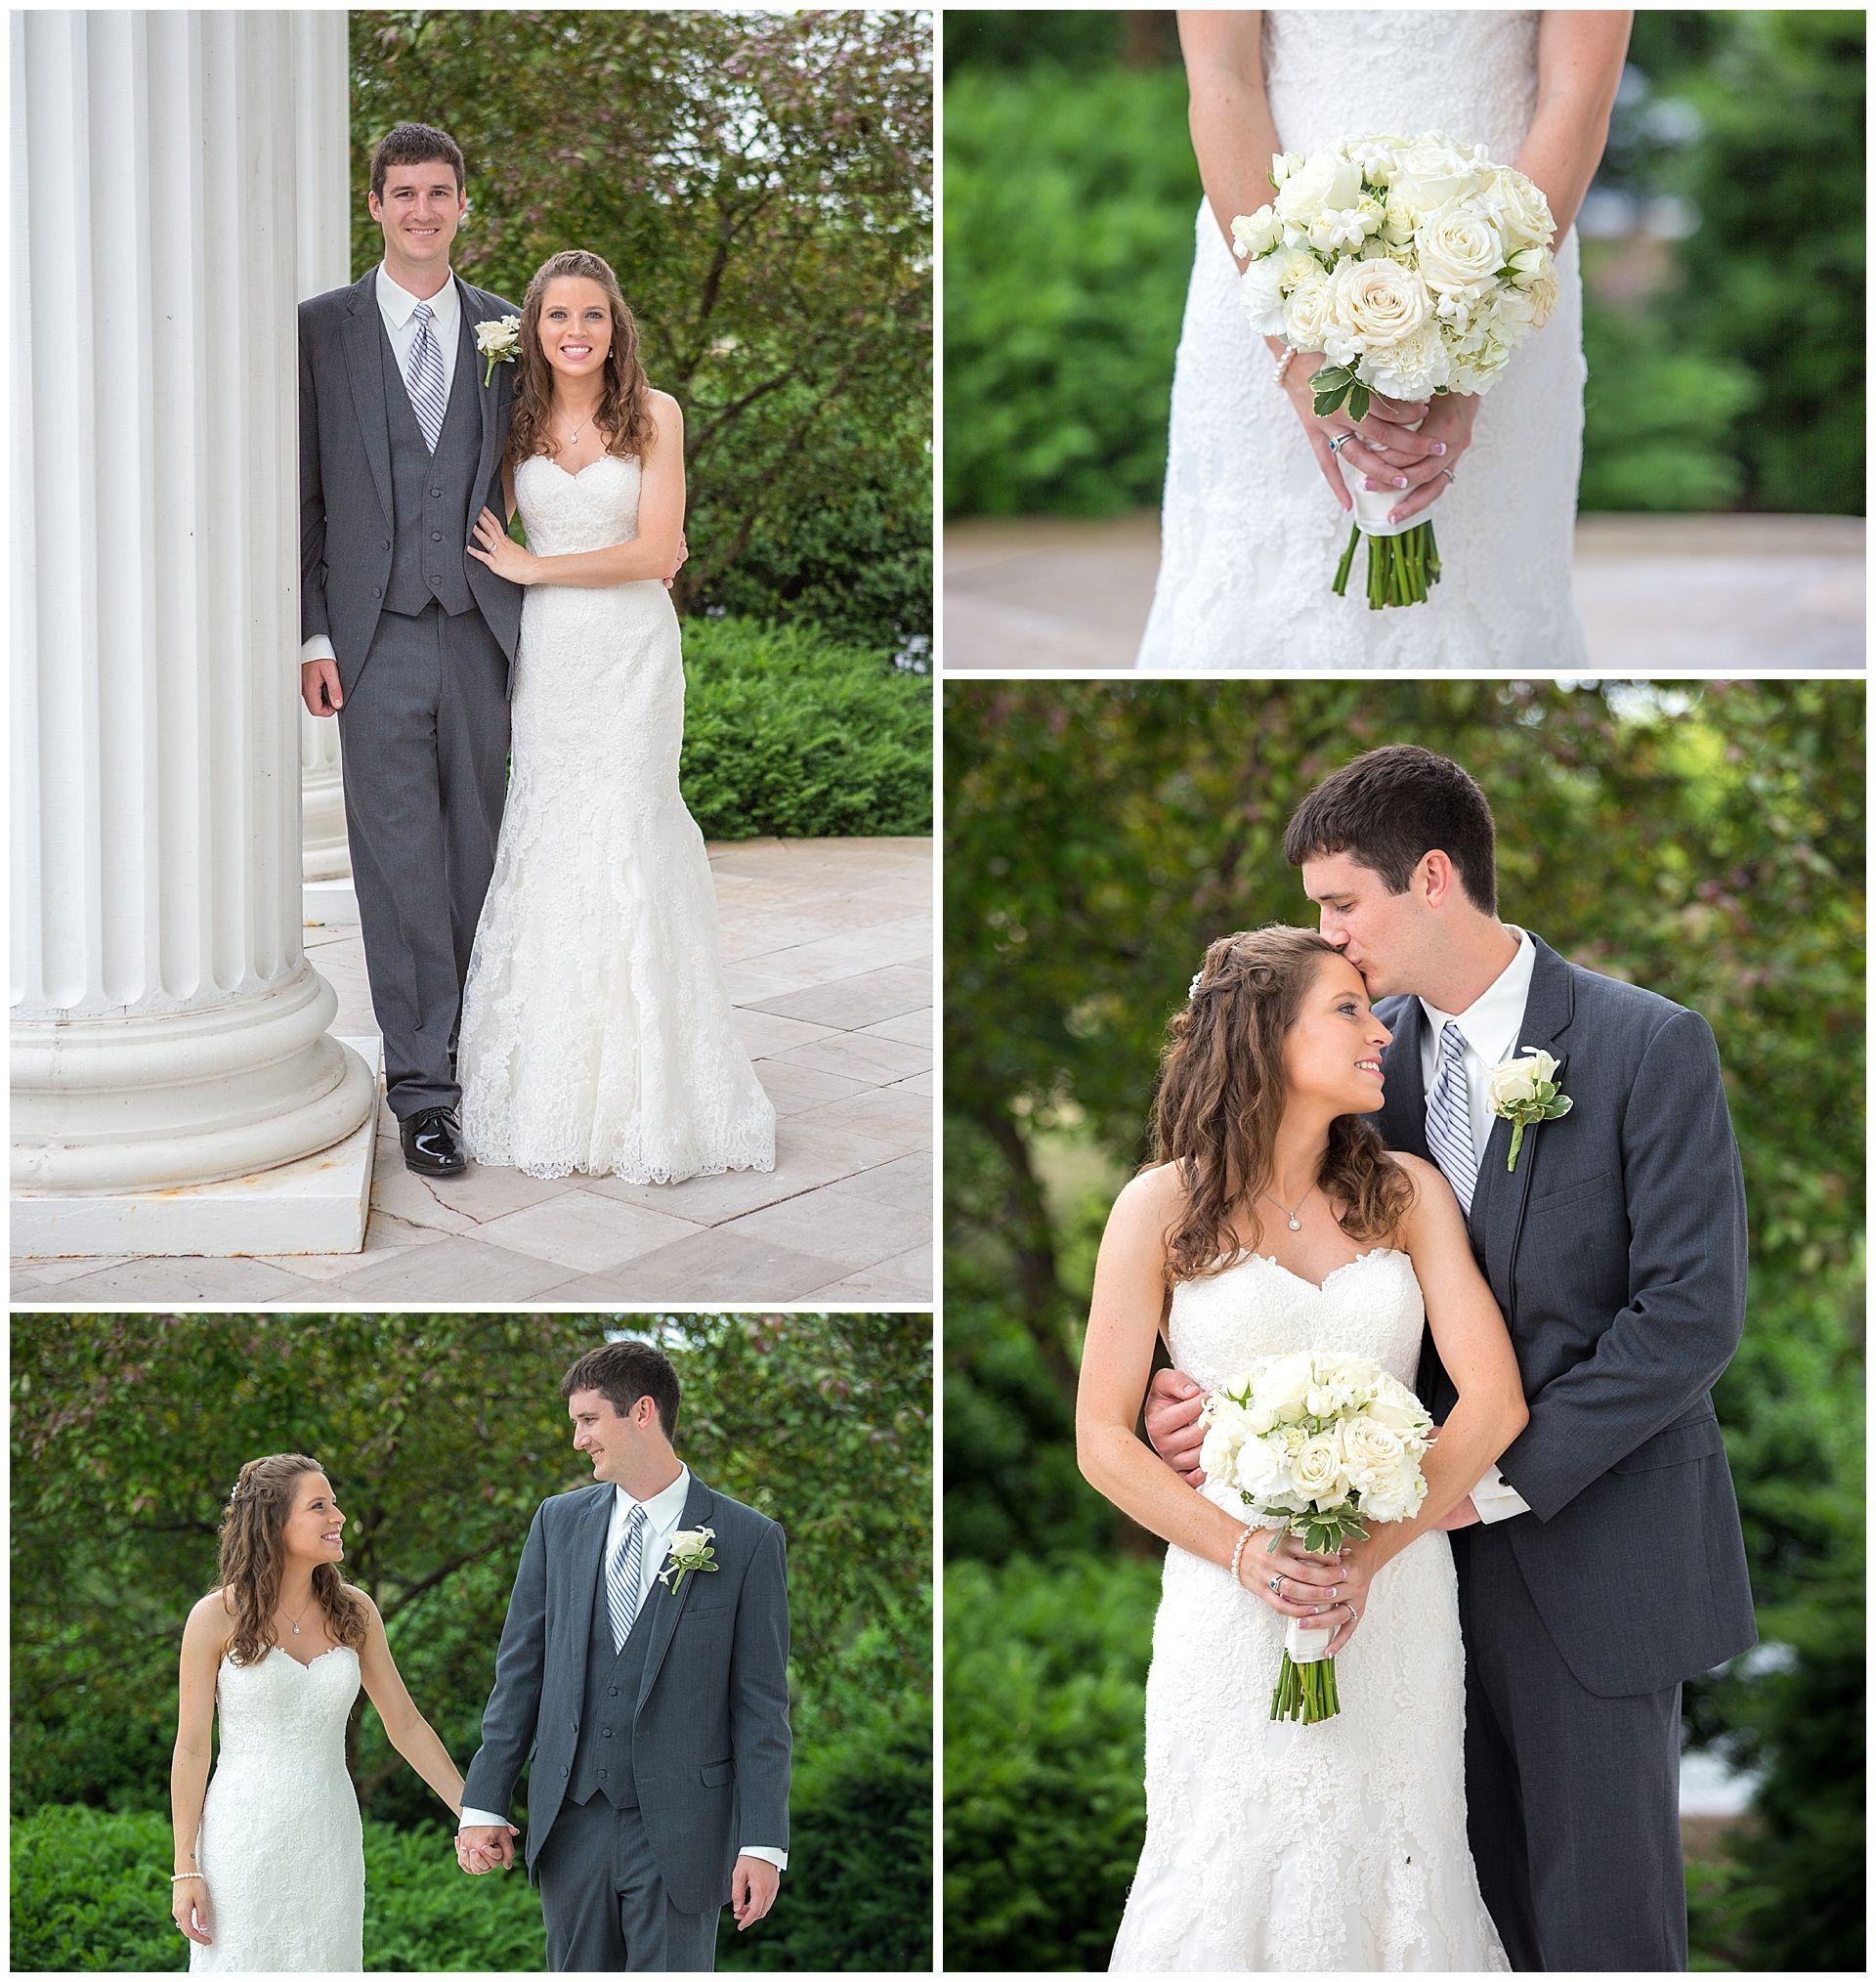 Wedding Flowers Lexington Ky: Summer Wedding At The Griffin Gate Marriott In Lexington